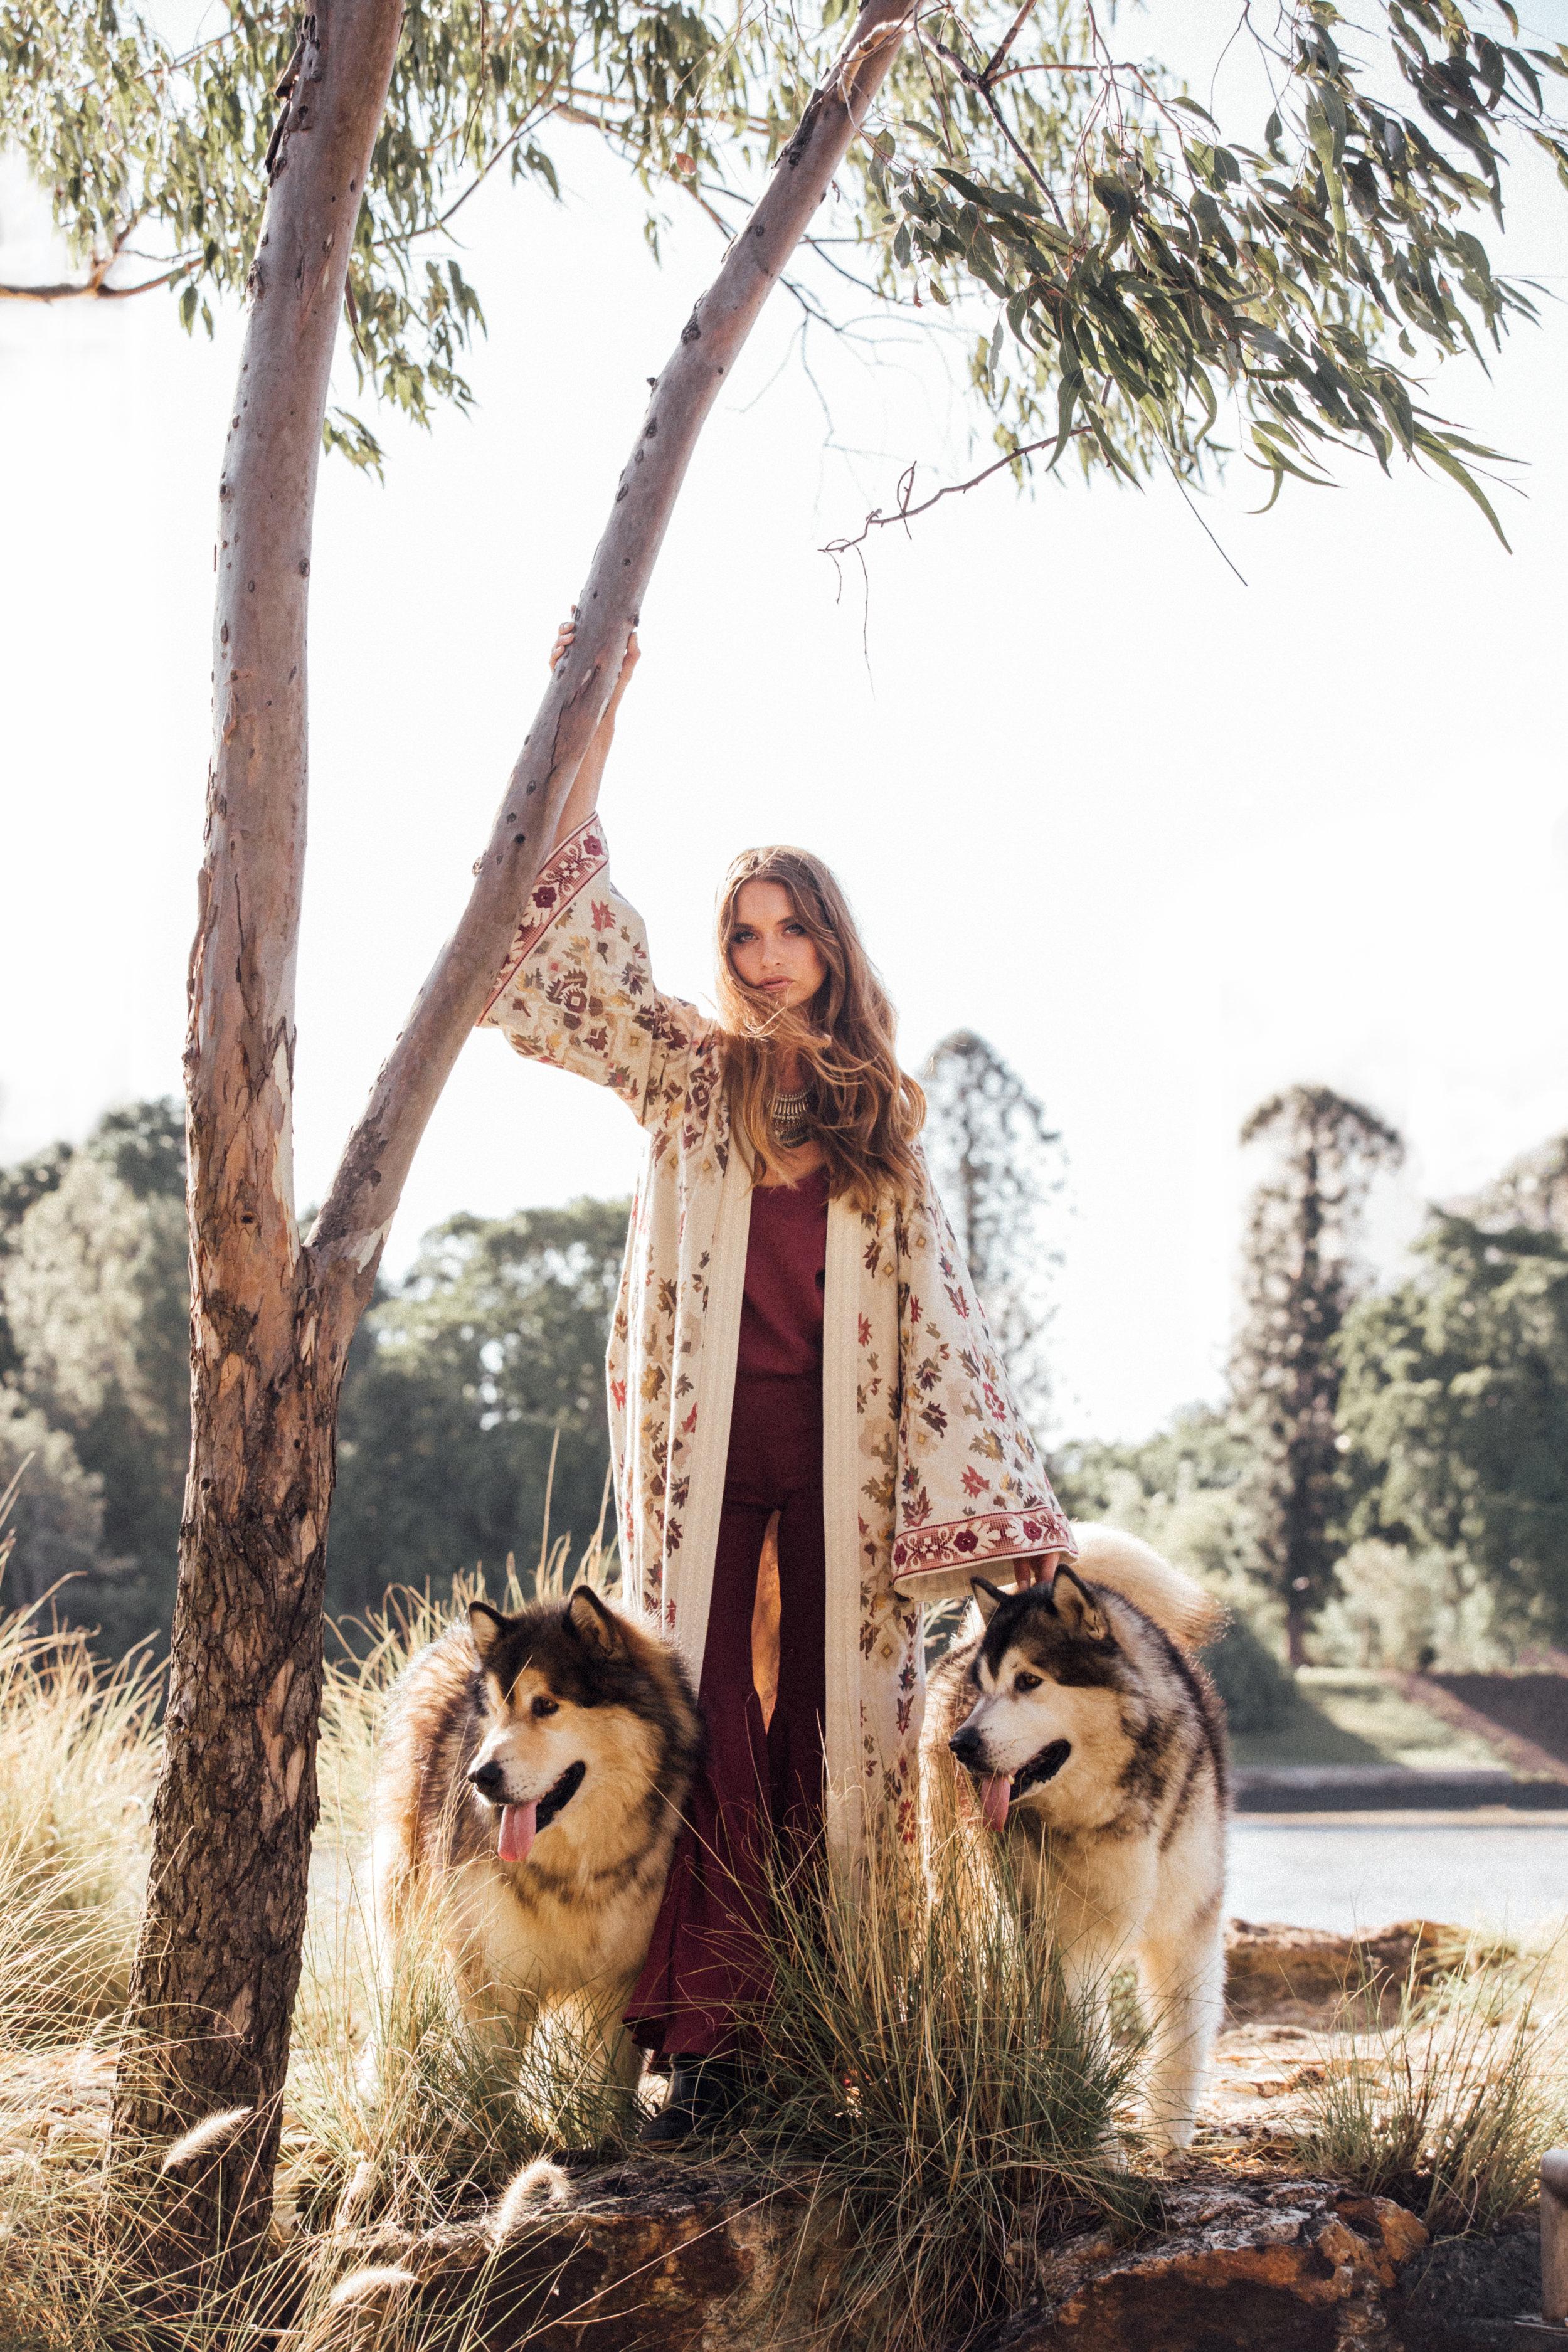 Wilde Willow Spring Lookbook 2018 by Anne Carolien Kohler 74.jpg